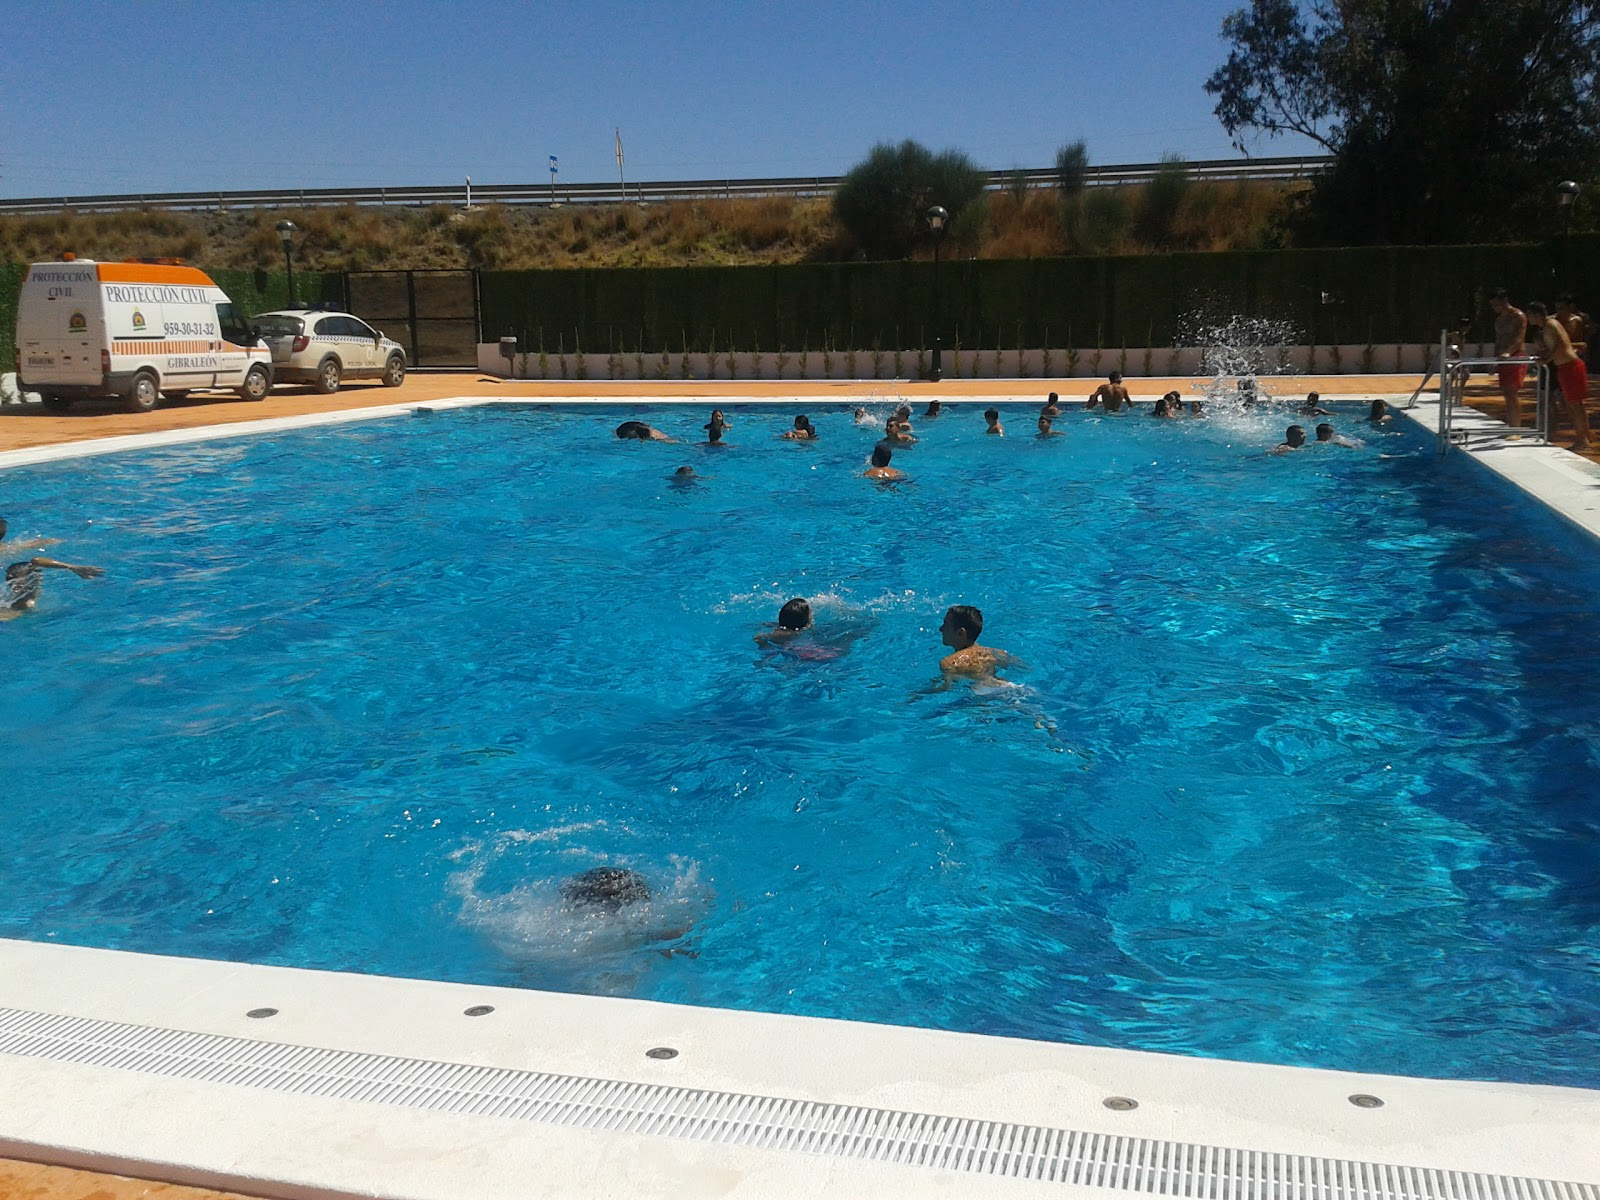 Pmd gibrale n piscina municipal temporada de verano for Piscina municipal de salt